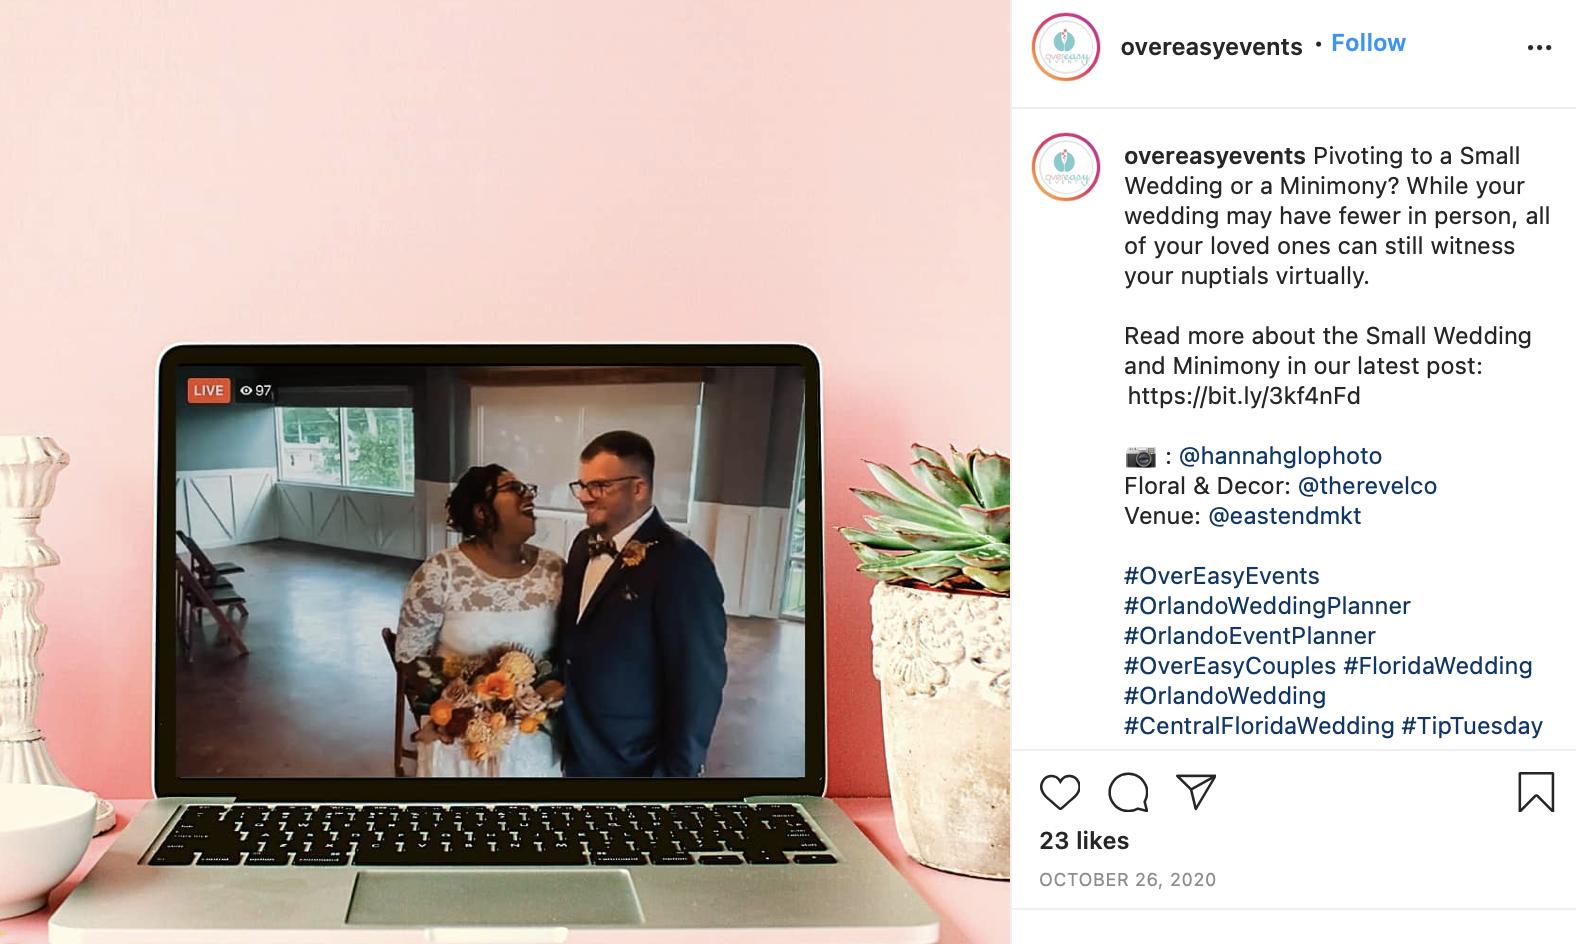 wedding trends - having a virtual wedding ceremony